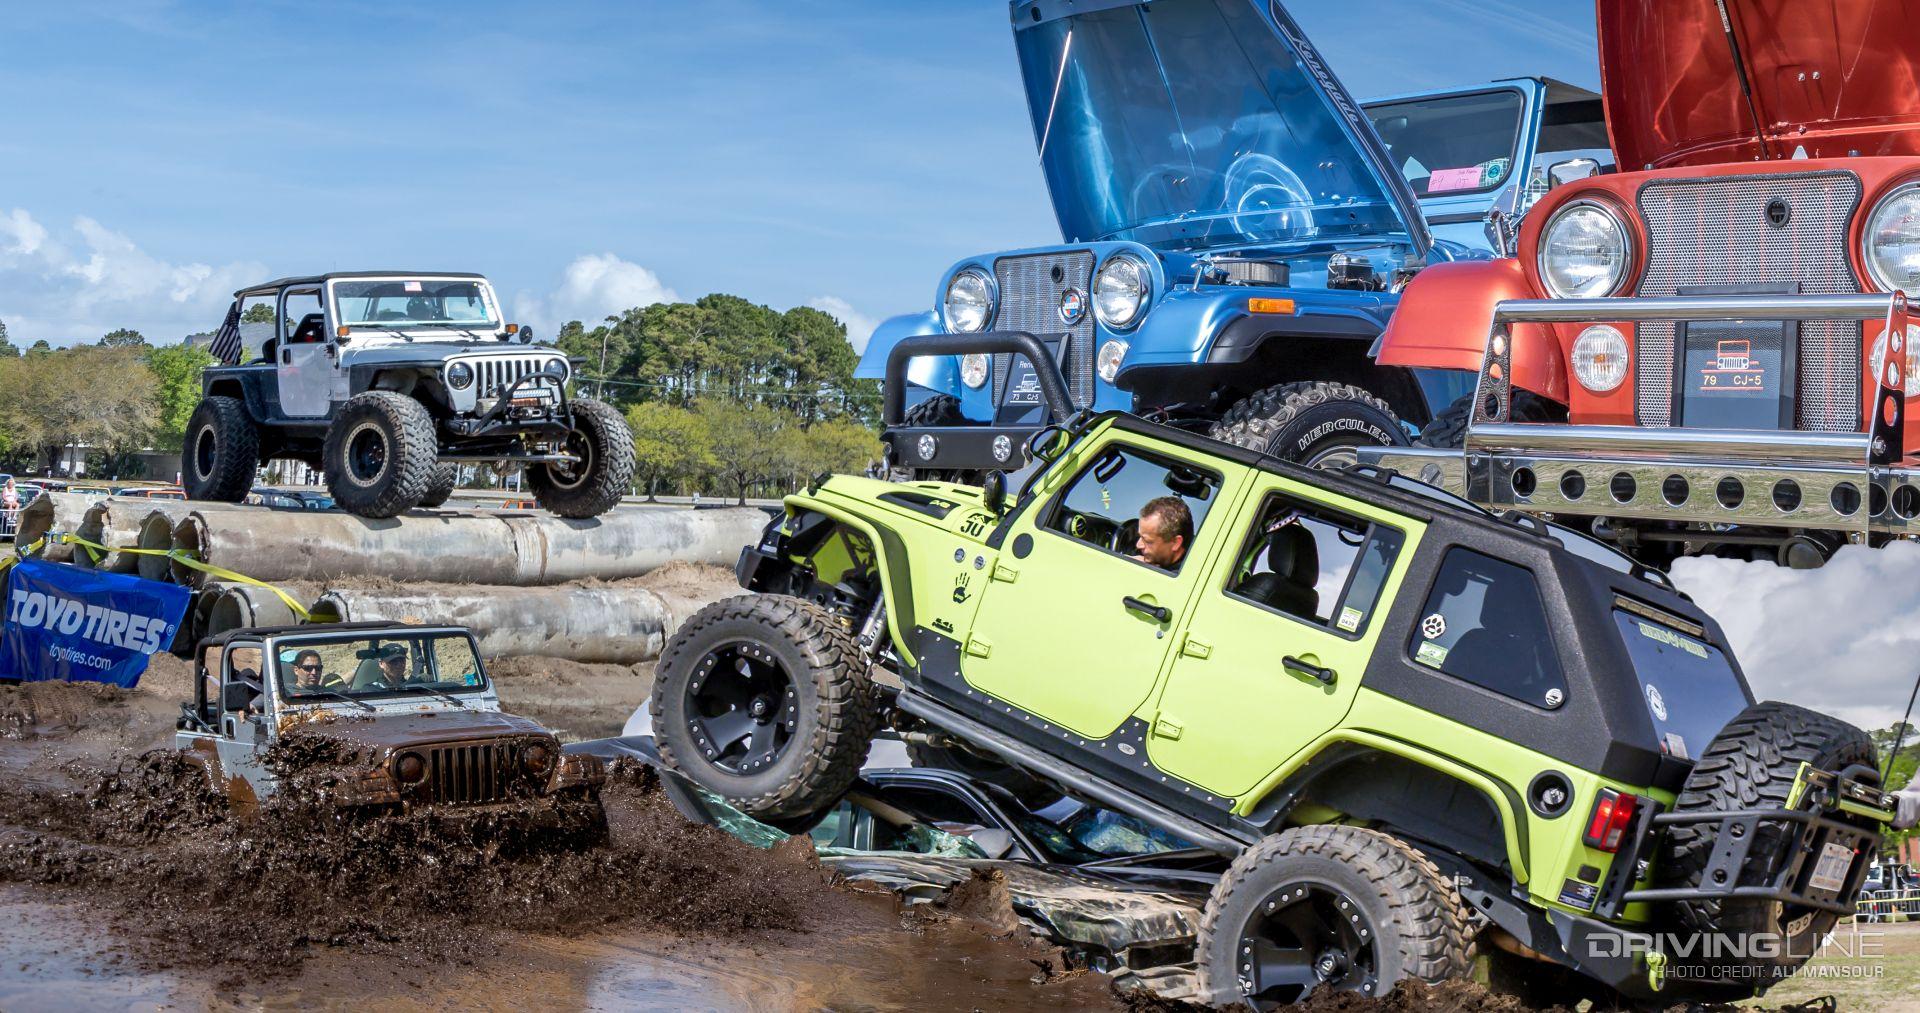 2018 Myrtle Beach Jeep Jam Video Drivingline